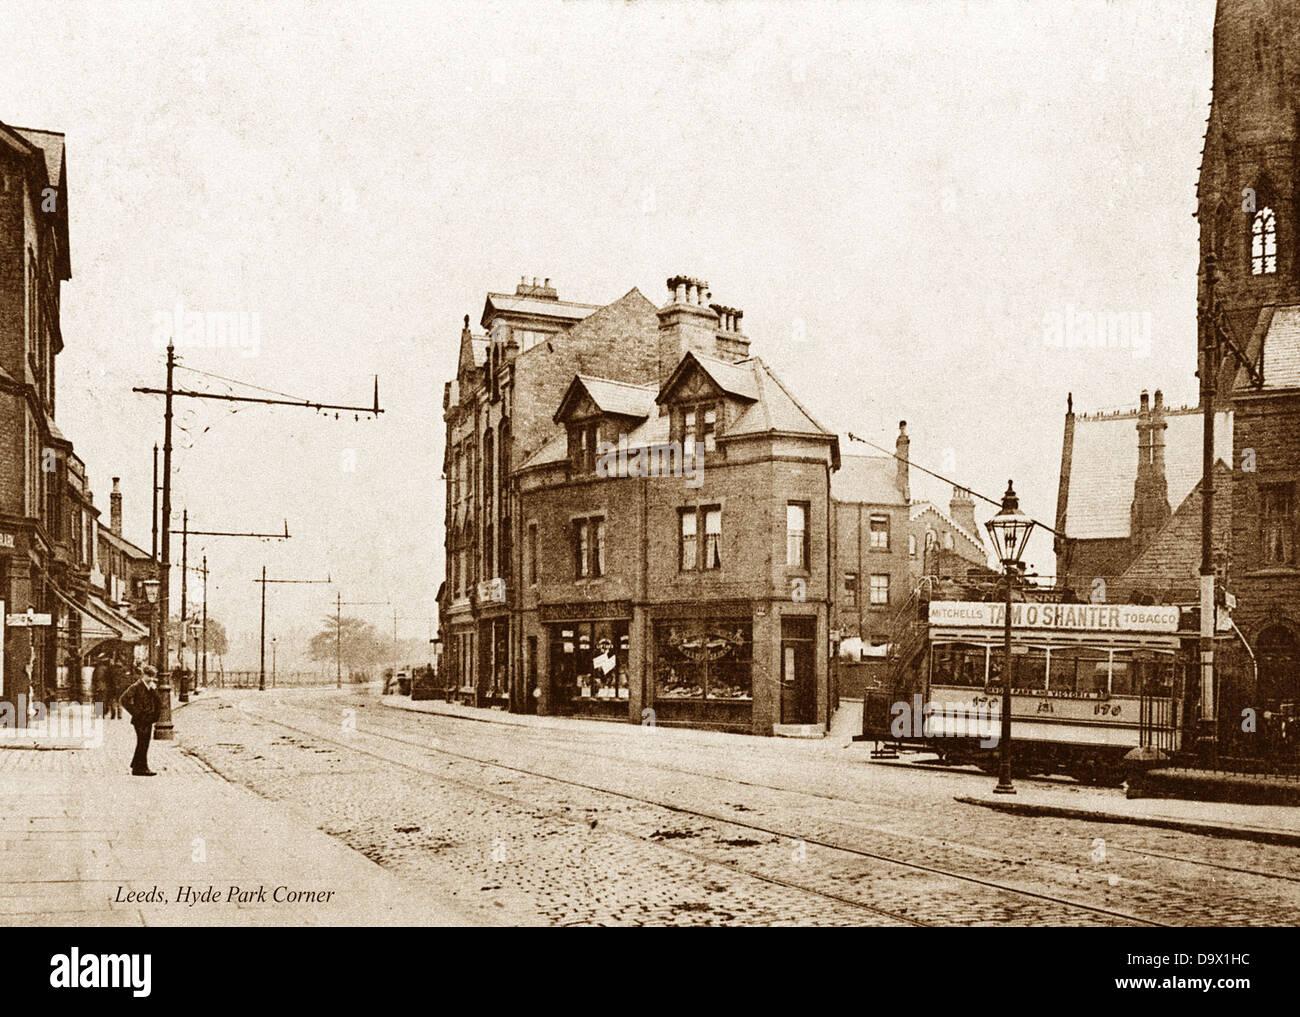 Leeds Hyde Park Corner early 1900s - Stock Image